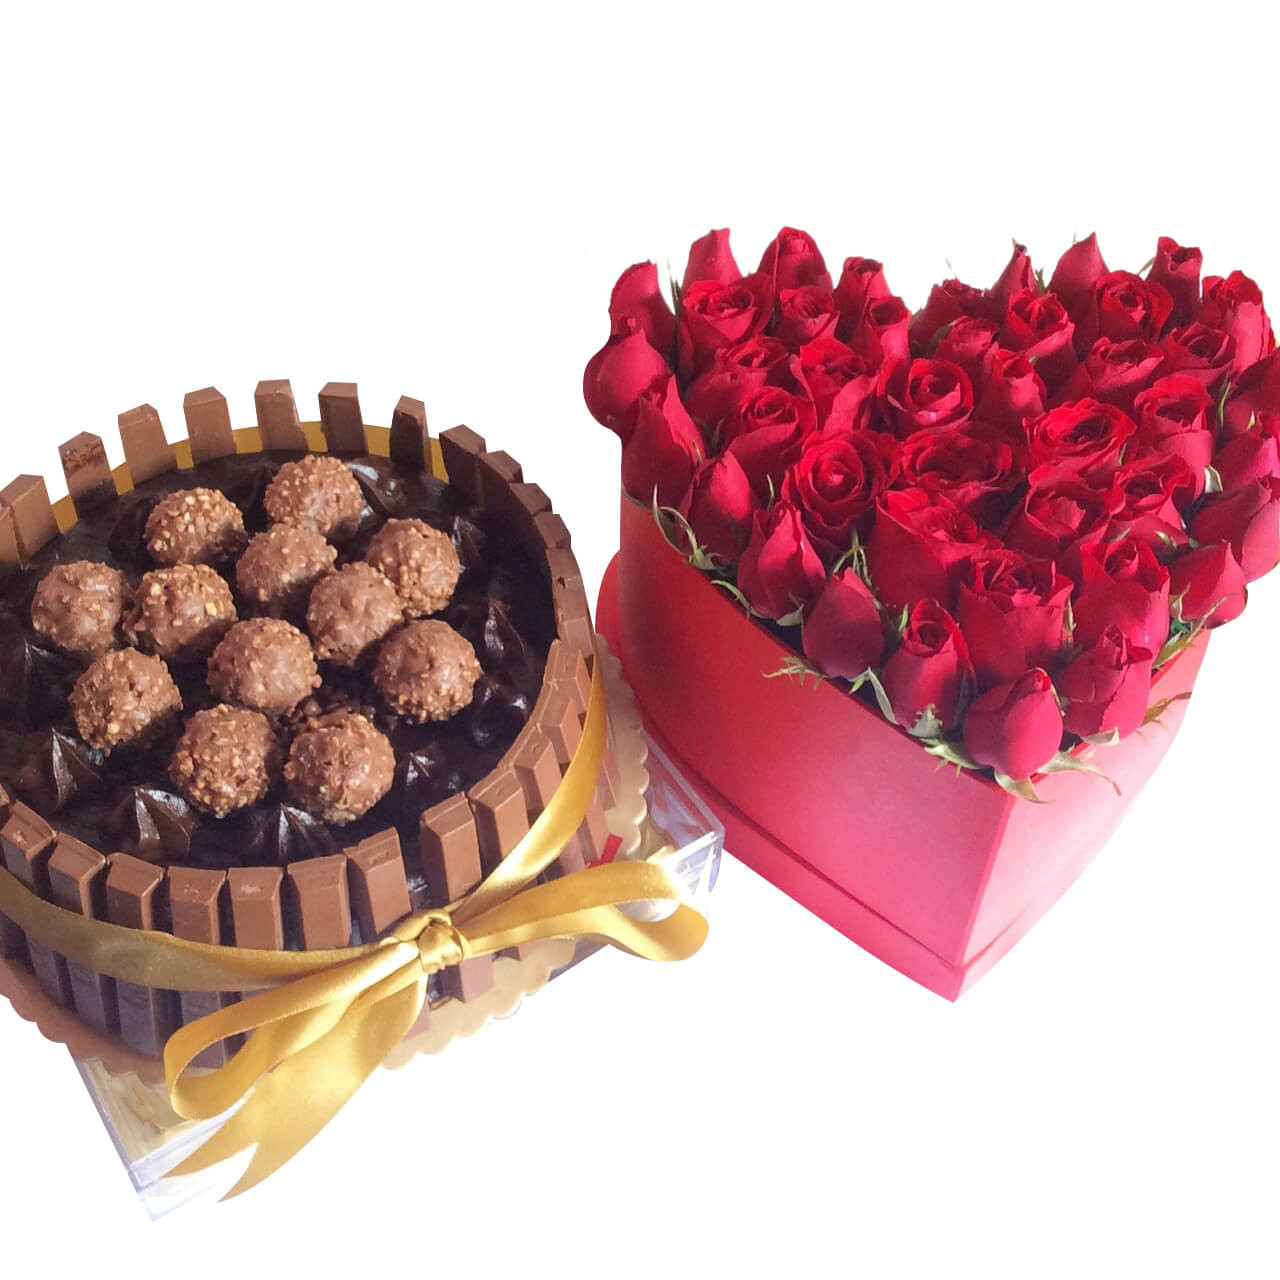 Roses Heart Box & Ferrero Kit Kat Choco Cake (customizable)